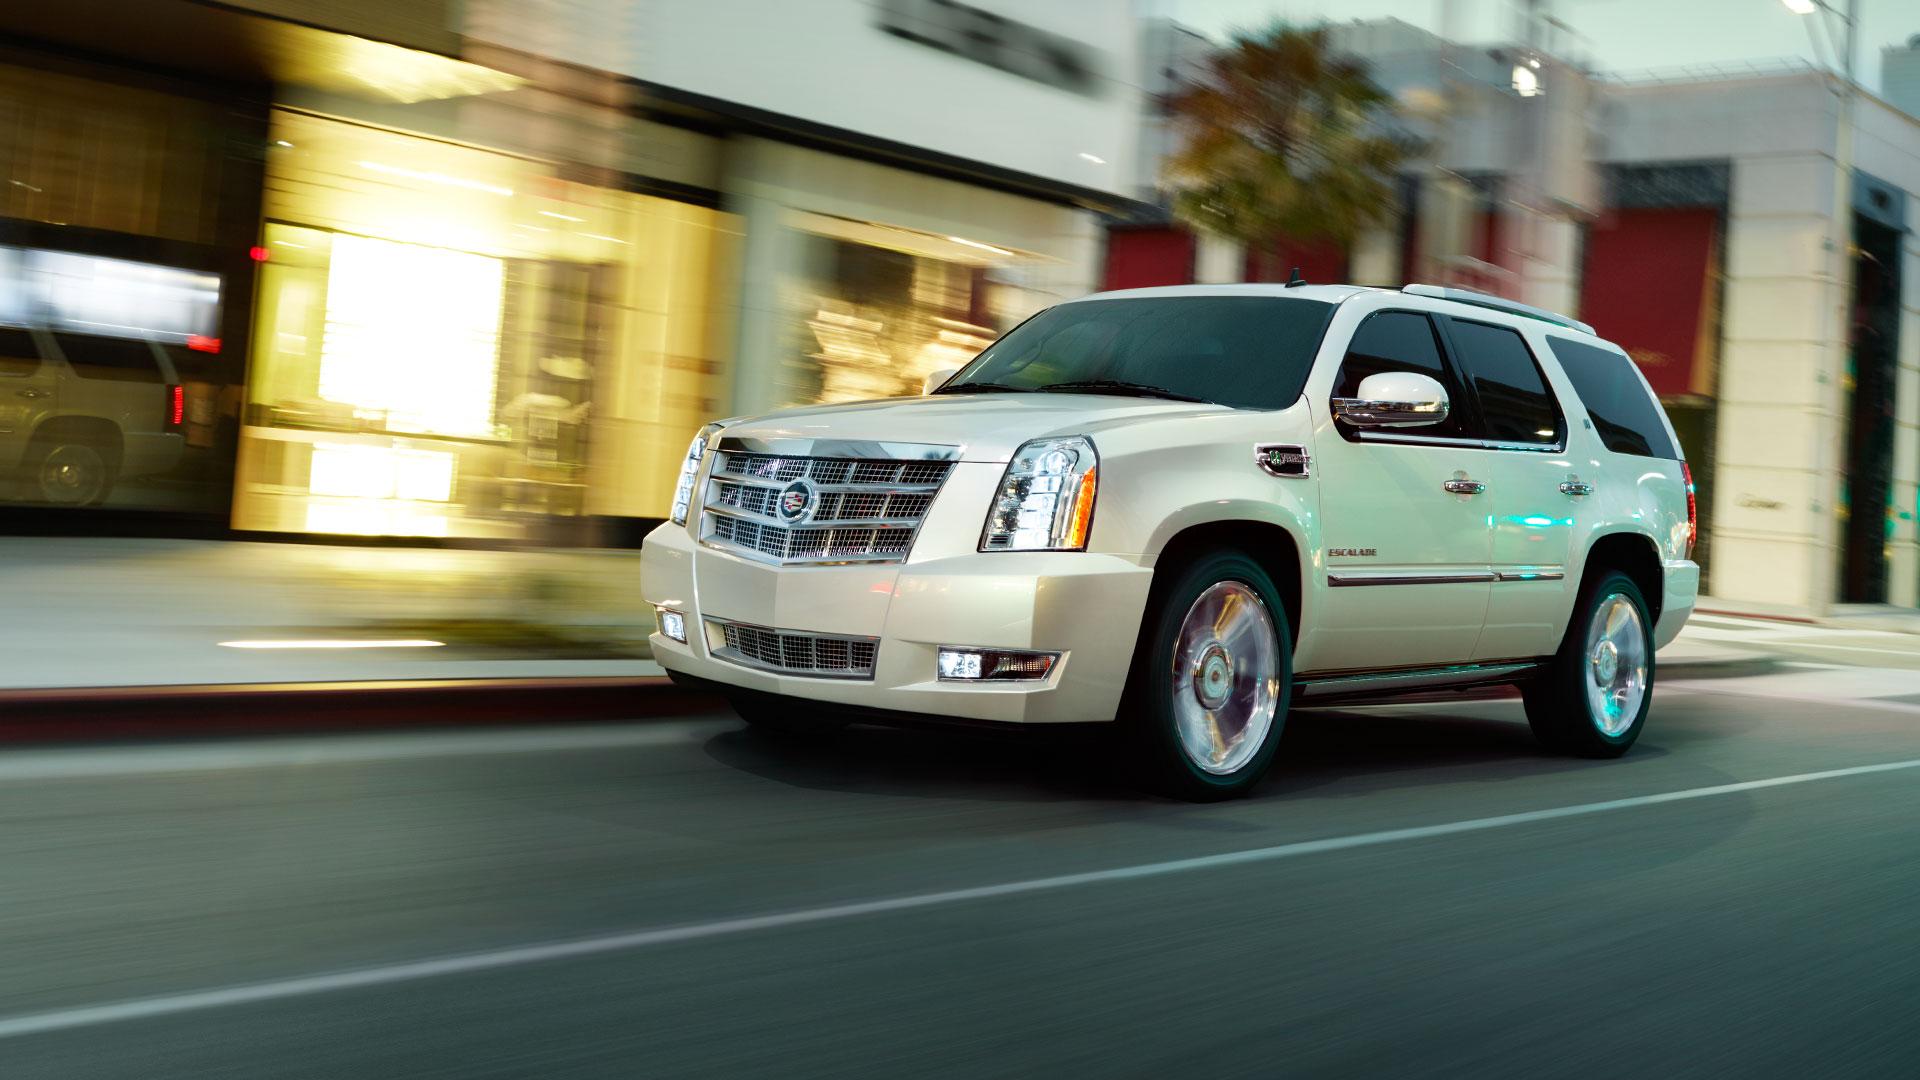 Cadillac escalade vs jeep grand cherokee 2014 autos post